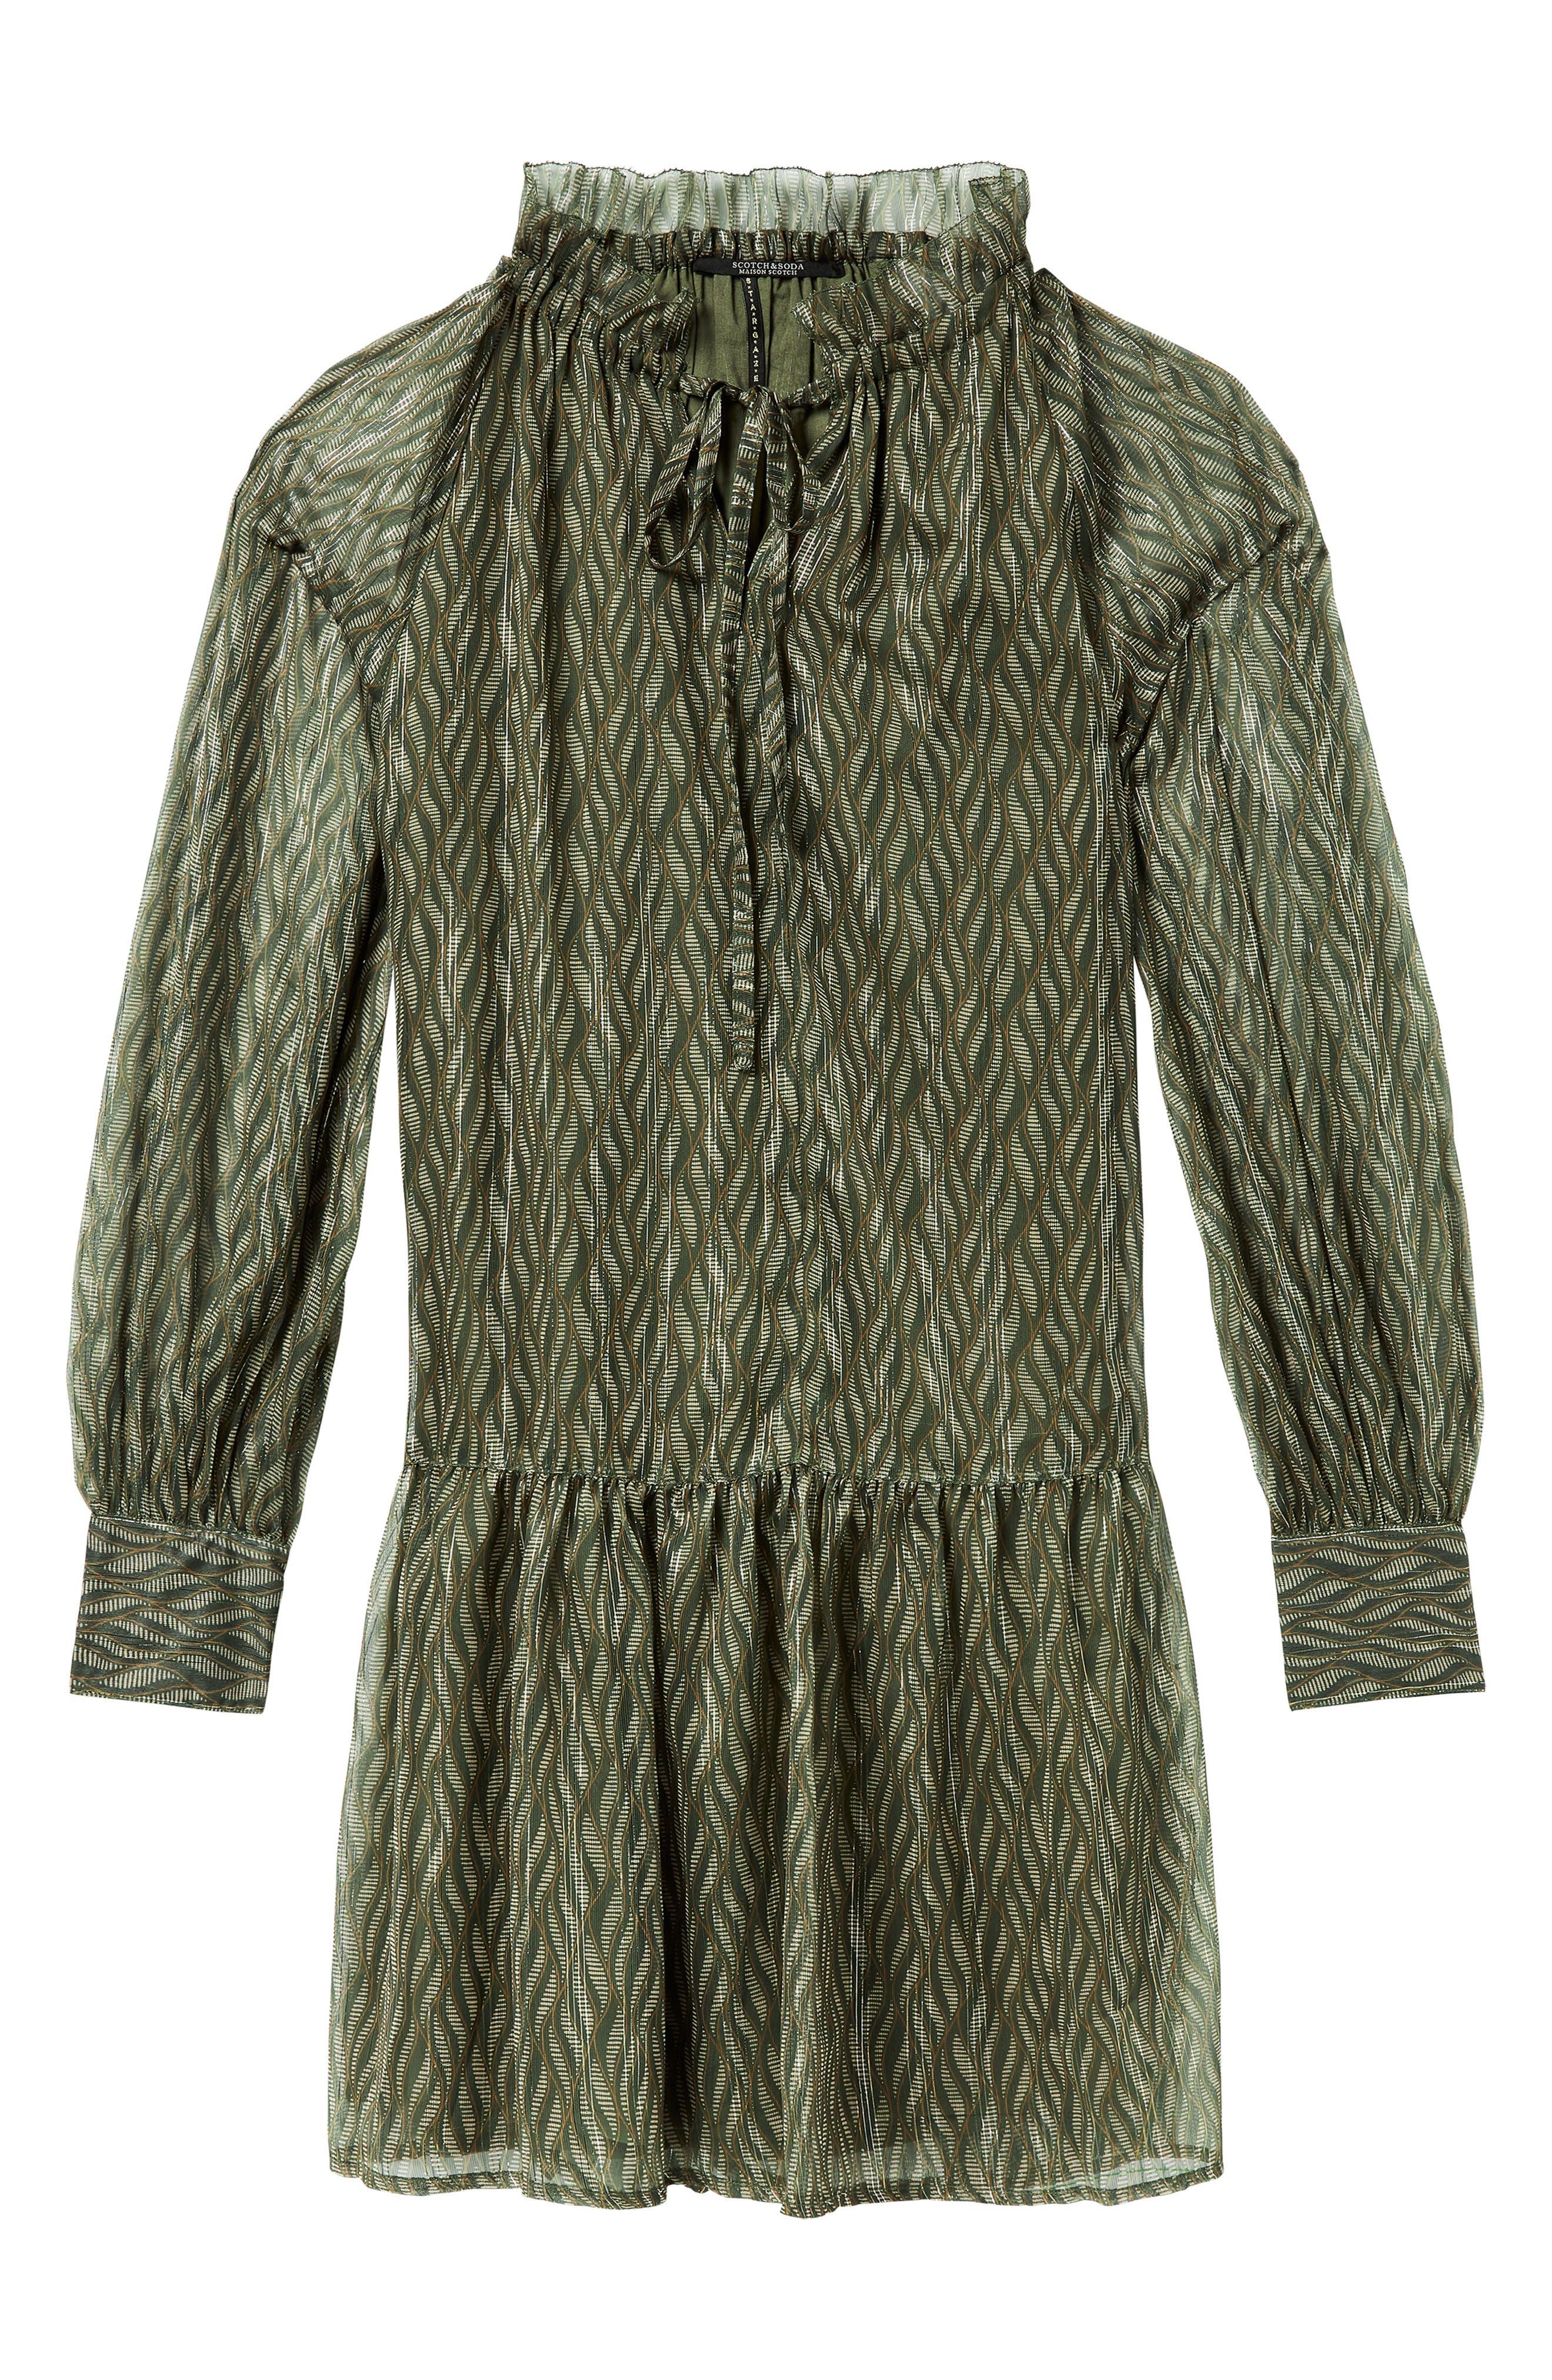 Print Metallic Ruffle Hem Dress,                             Alternate thumbnail 3, color,                             SAGE GREEN PRINT W/